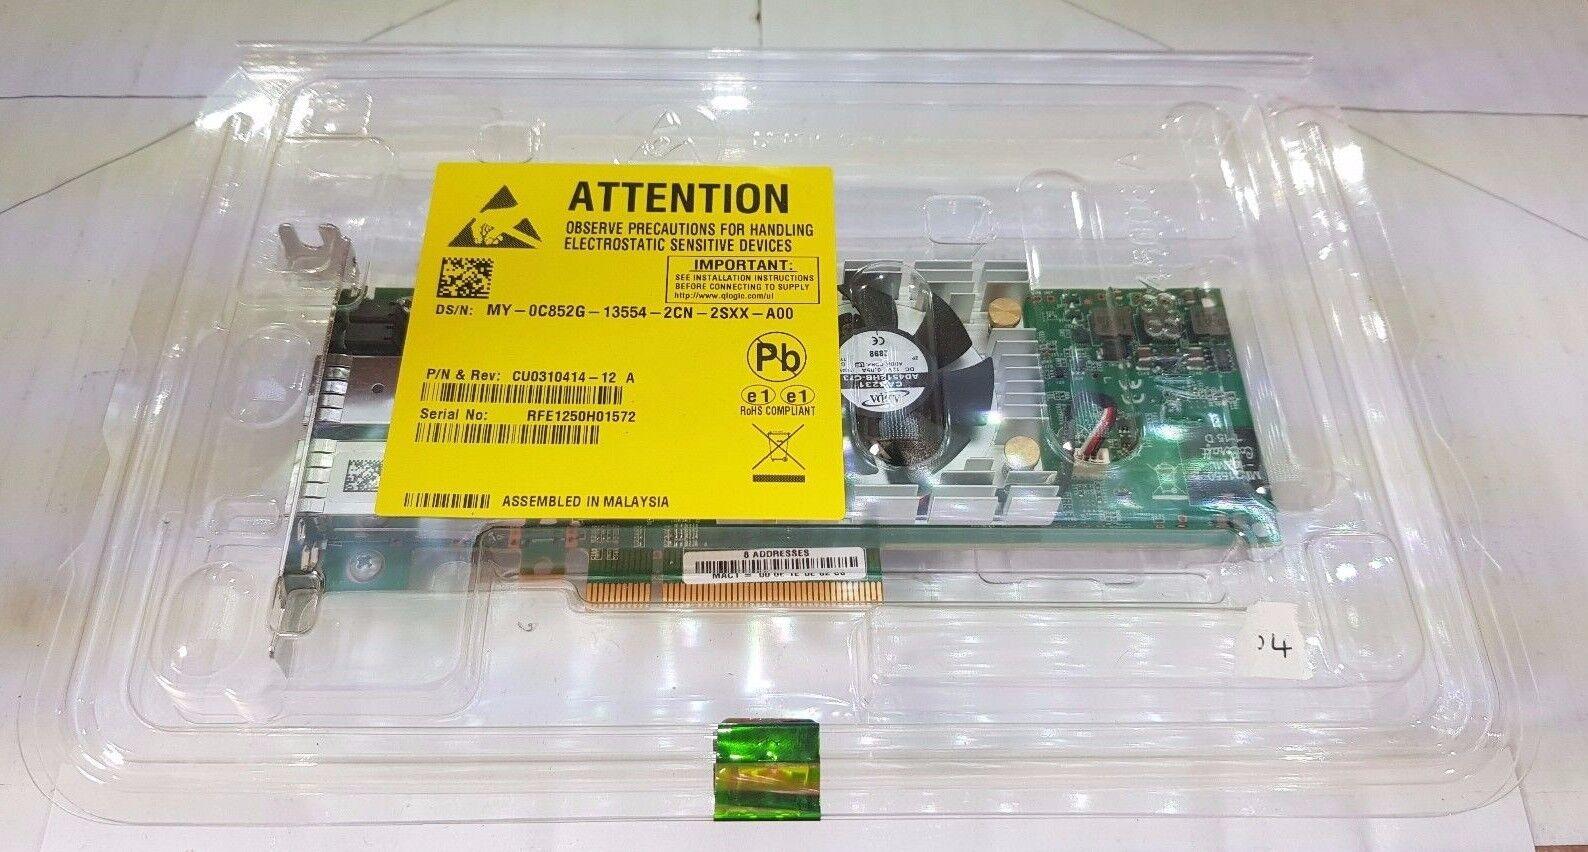 Dual Port SFP+ 10GbE 10GE iSCSI FCoE EtherNet PCI-e 2.0 x8 Dell C852G